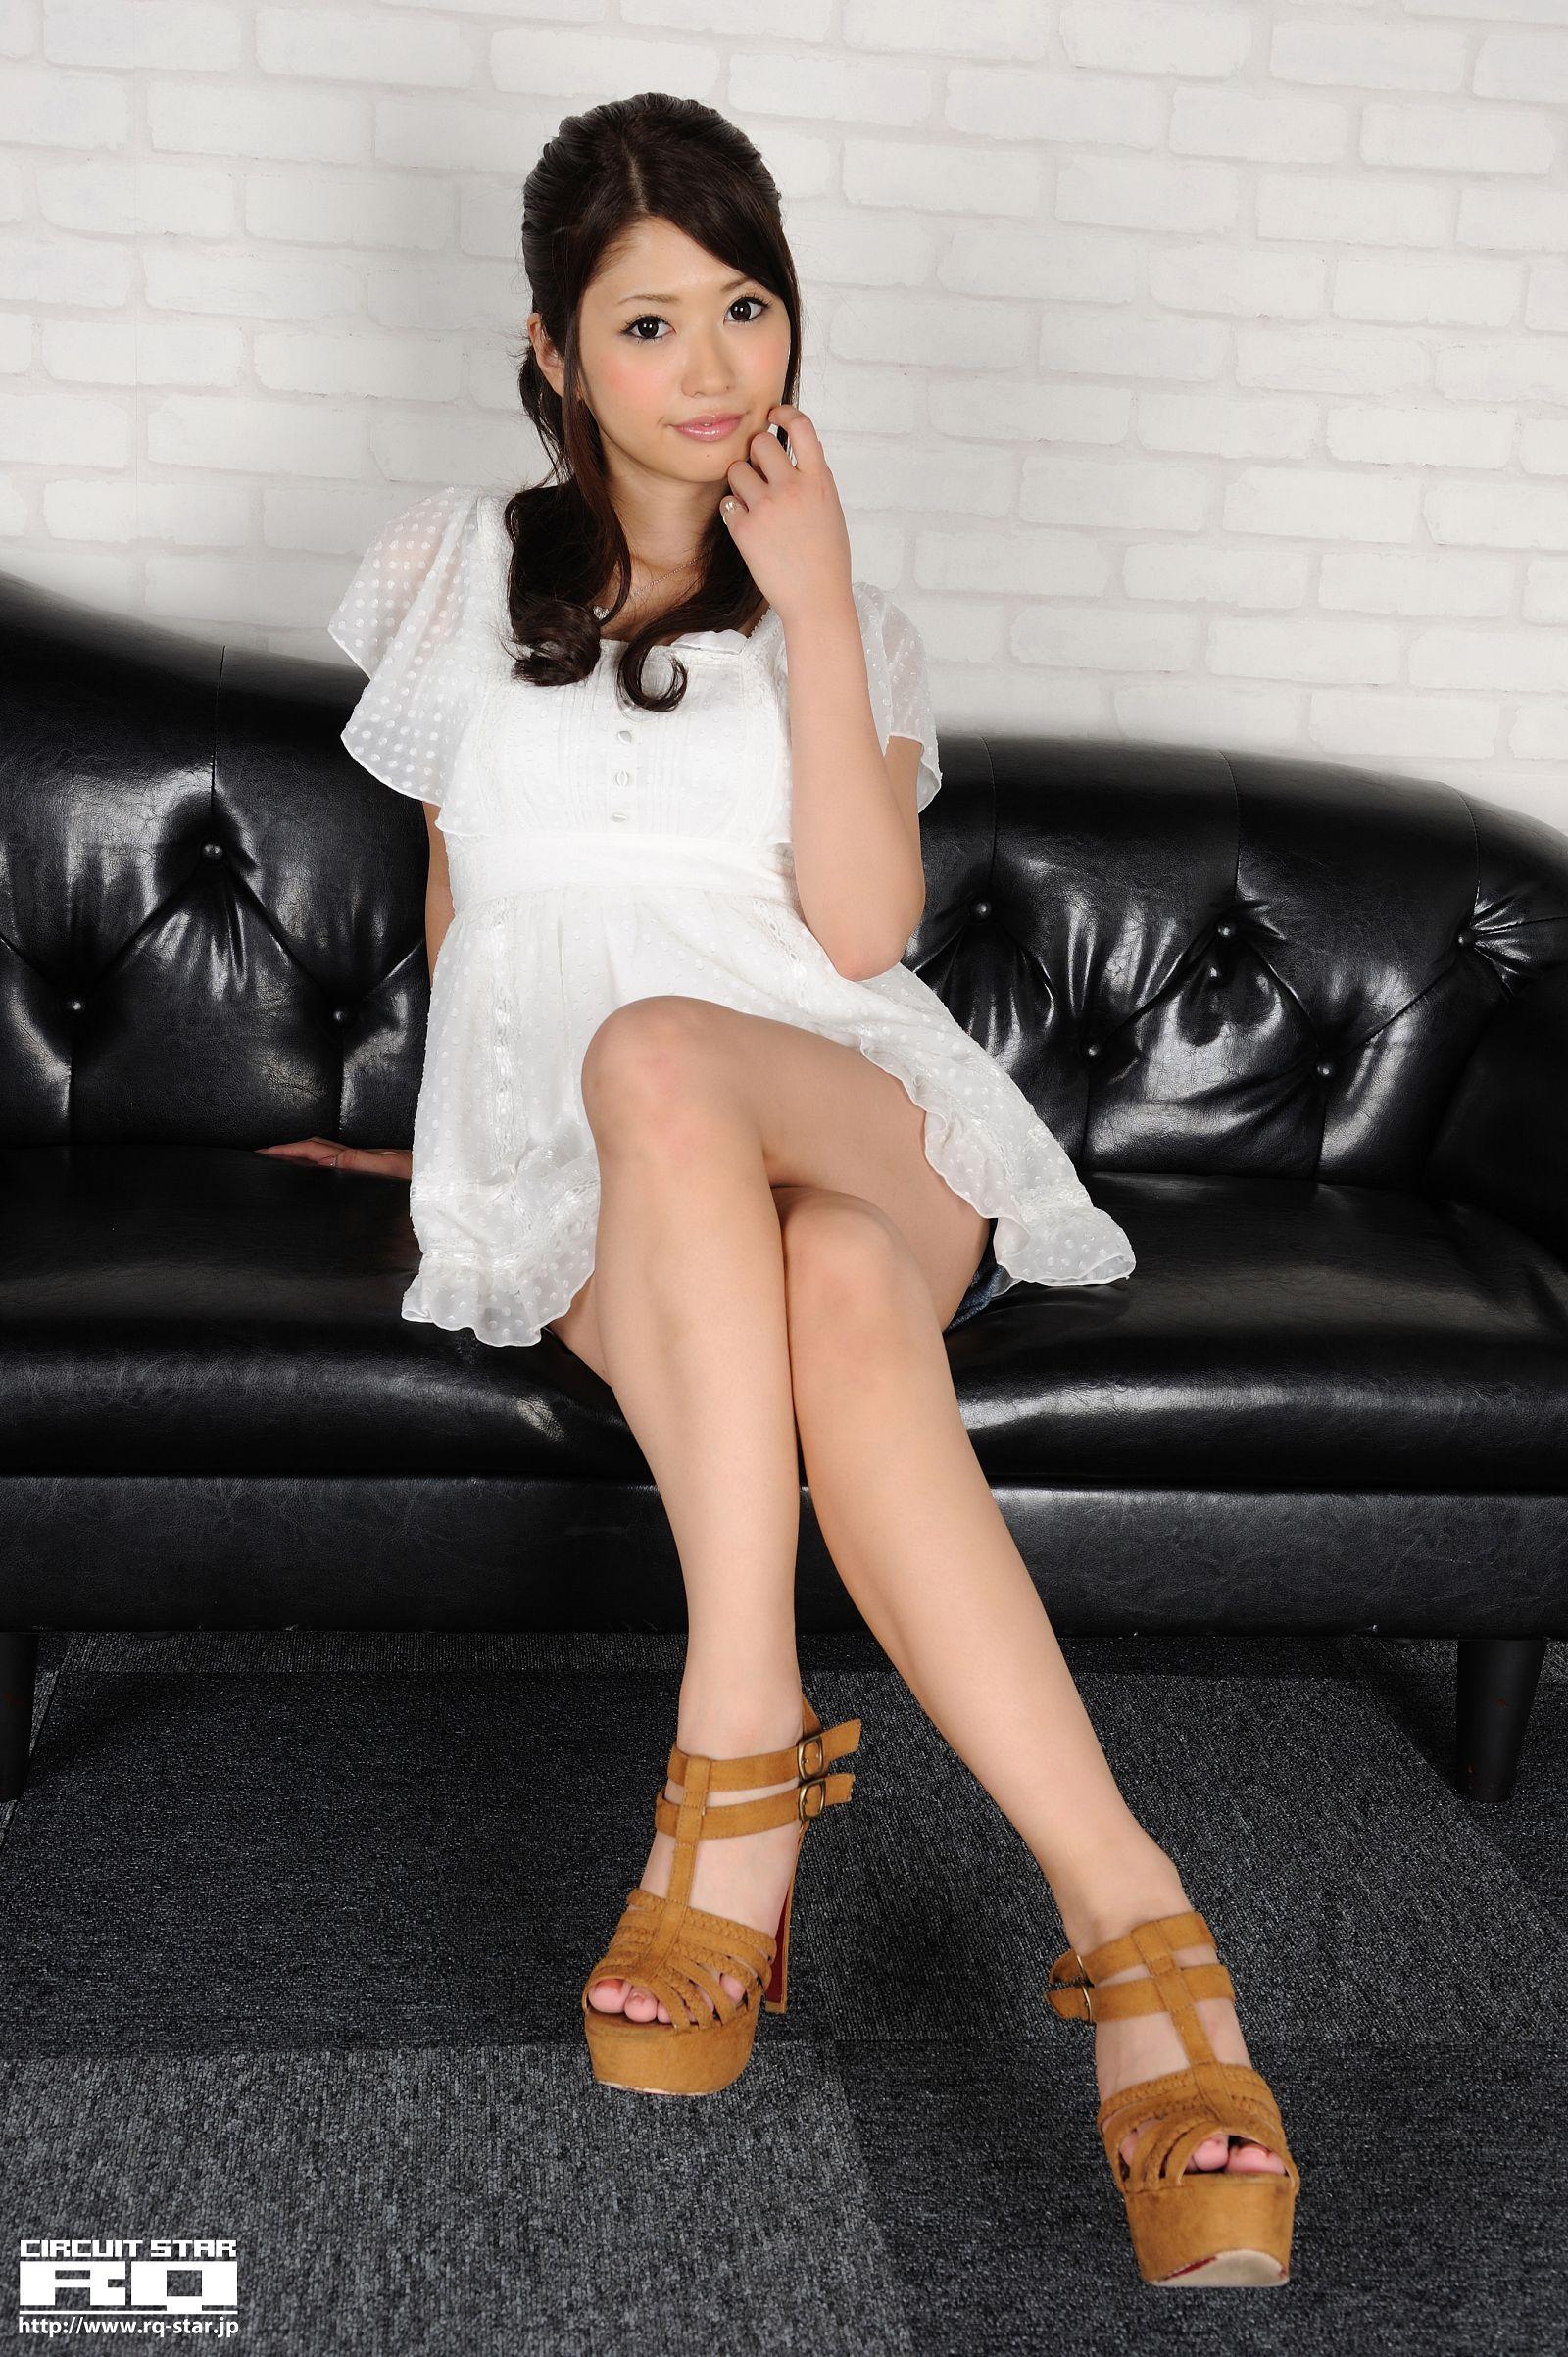 [RQ STAR美女] NO.01092 Hitomi Nose 能勢ひとみ Private Dress[72P] RQ STAR 第3张